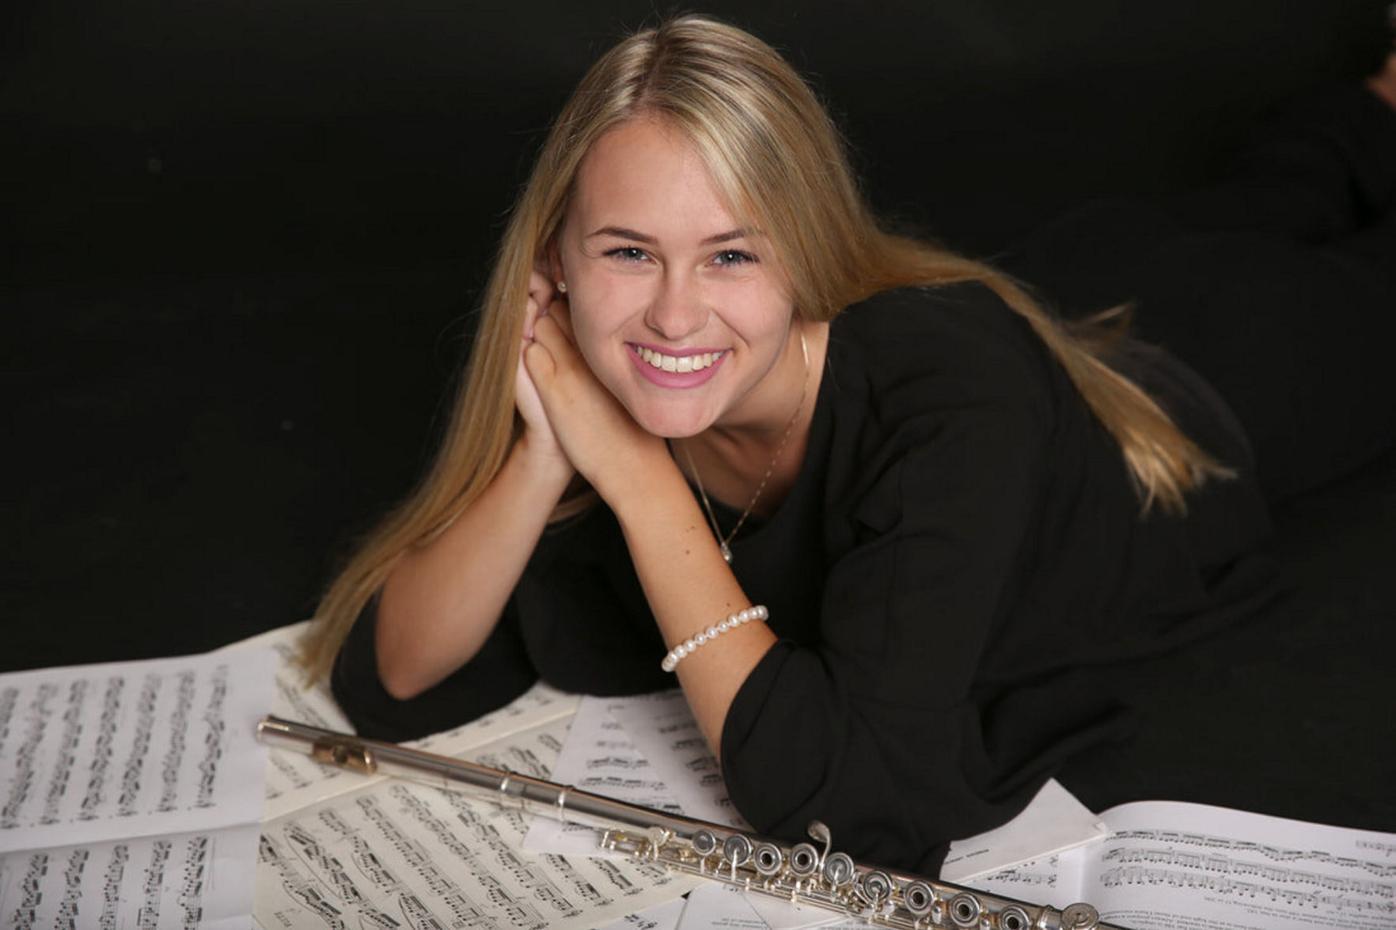 Samantha Humen